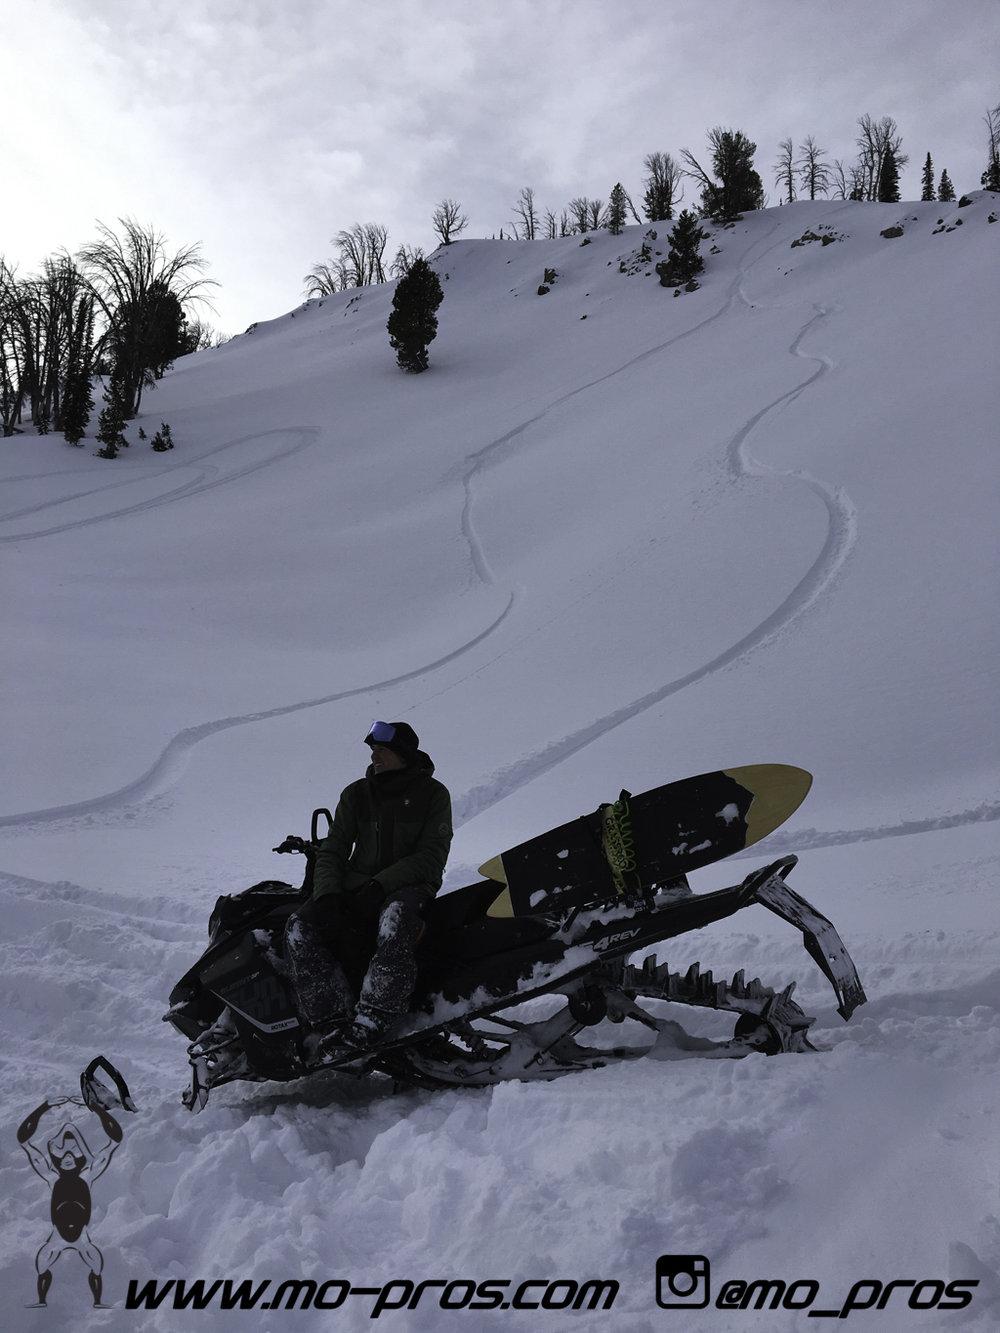 82_Tsaina Rack_Timbersled rack_Timbersled Rack_timbersled bag_snowmobile bag_Snowmobile_Snowboarding_Snowboard rack_snowboard_Snowbike_Ski_Rack_LinQ Snowboard Ski_Gun Rack_Gear_gas Rack_Cheetah Facto.jpg